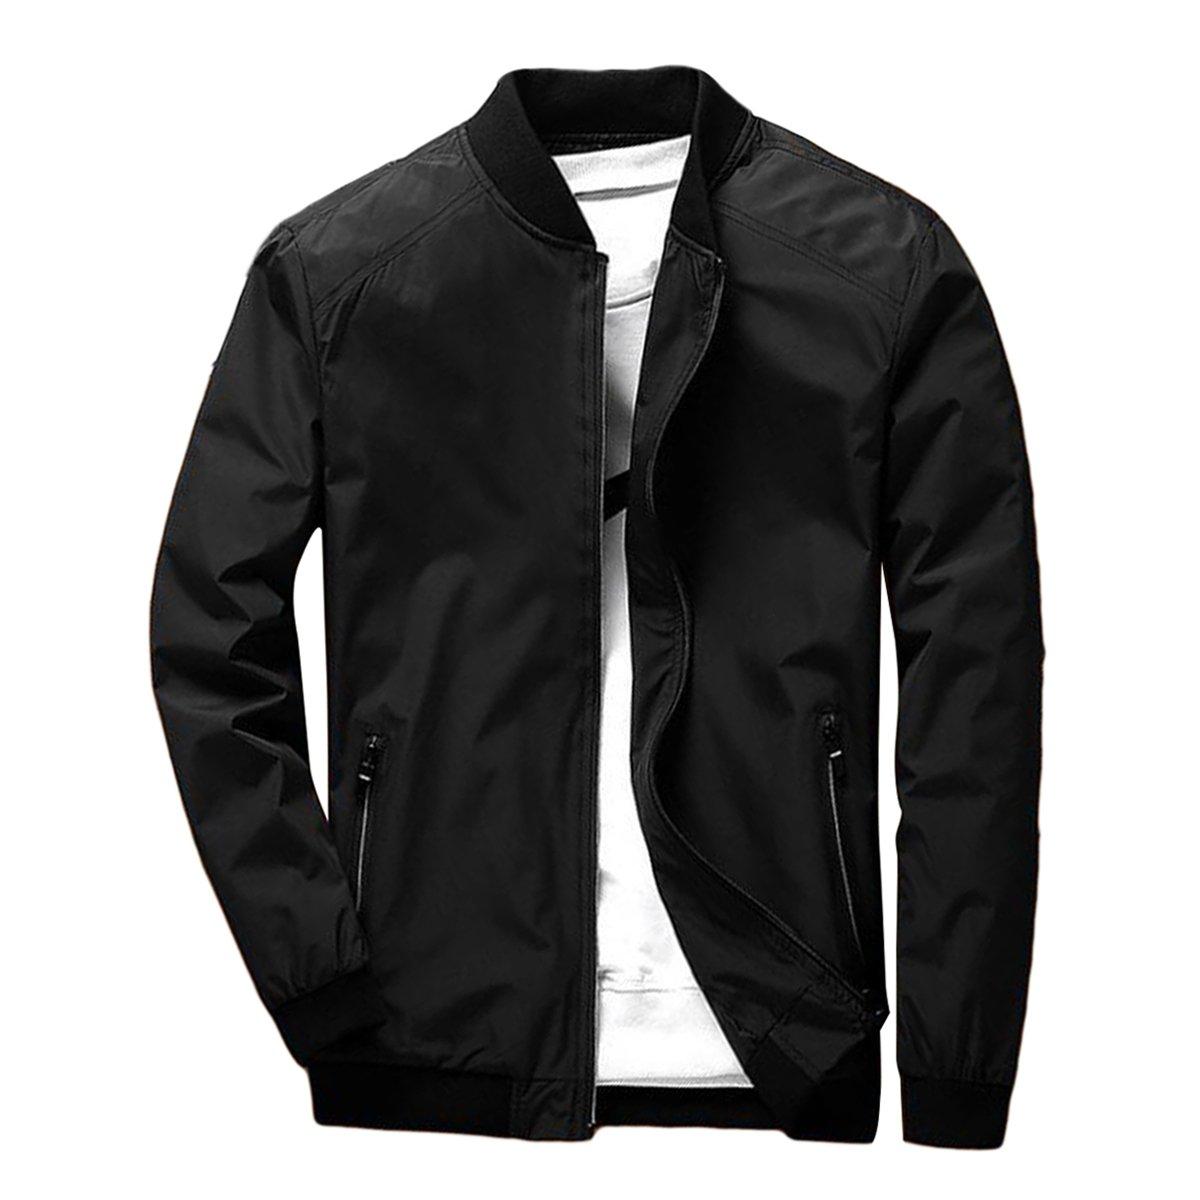 PrettyChic Men's Bomber Jacket Casual Light Slim Fit Full Zip Bike Outerwear Windbreaker, Black, Tag Size 3XL=US Size L